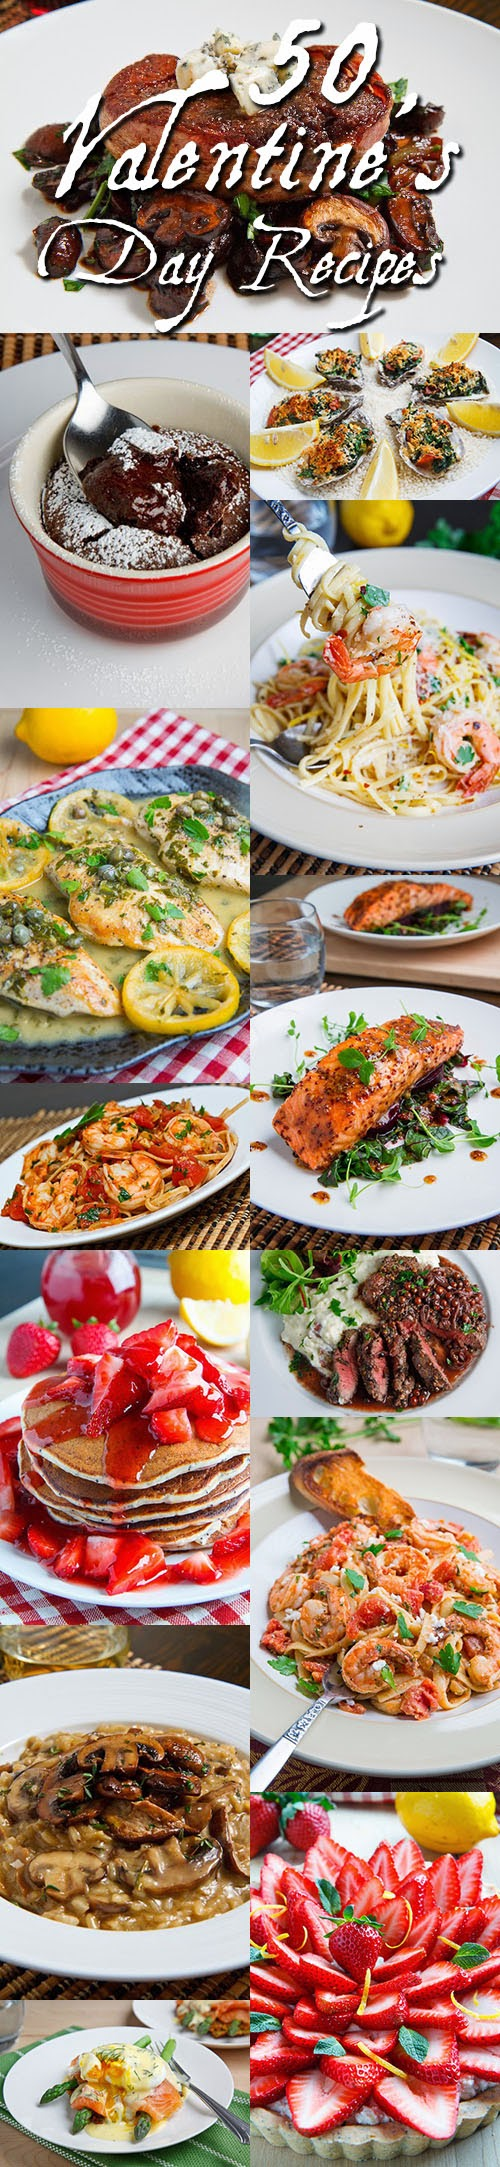 70 Valentine's Day Recipes